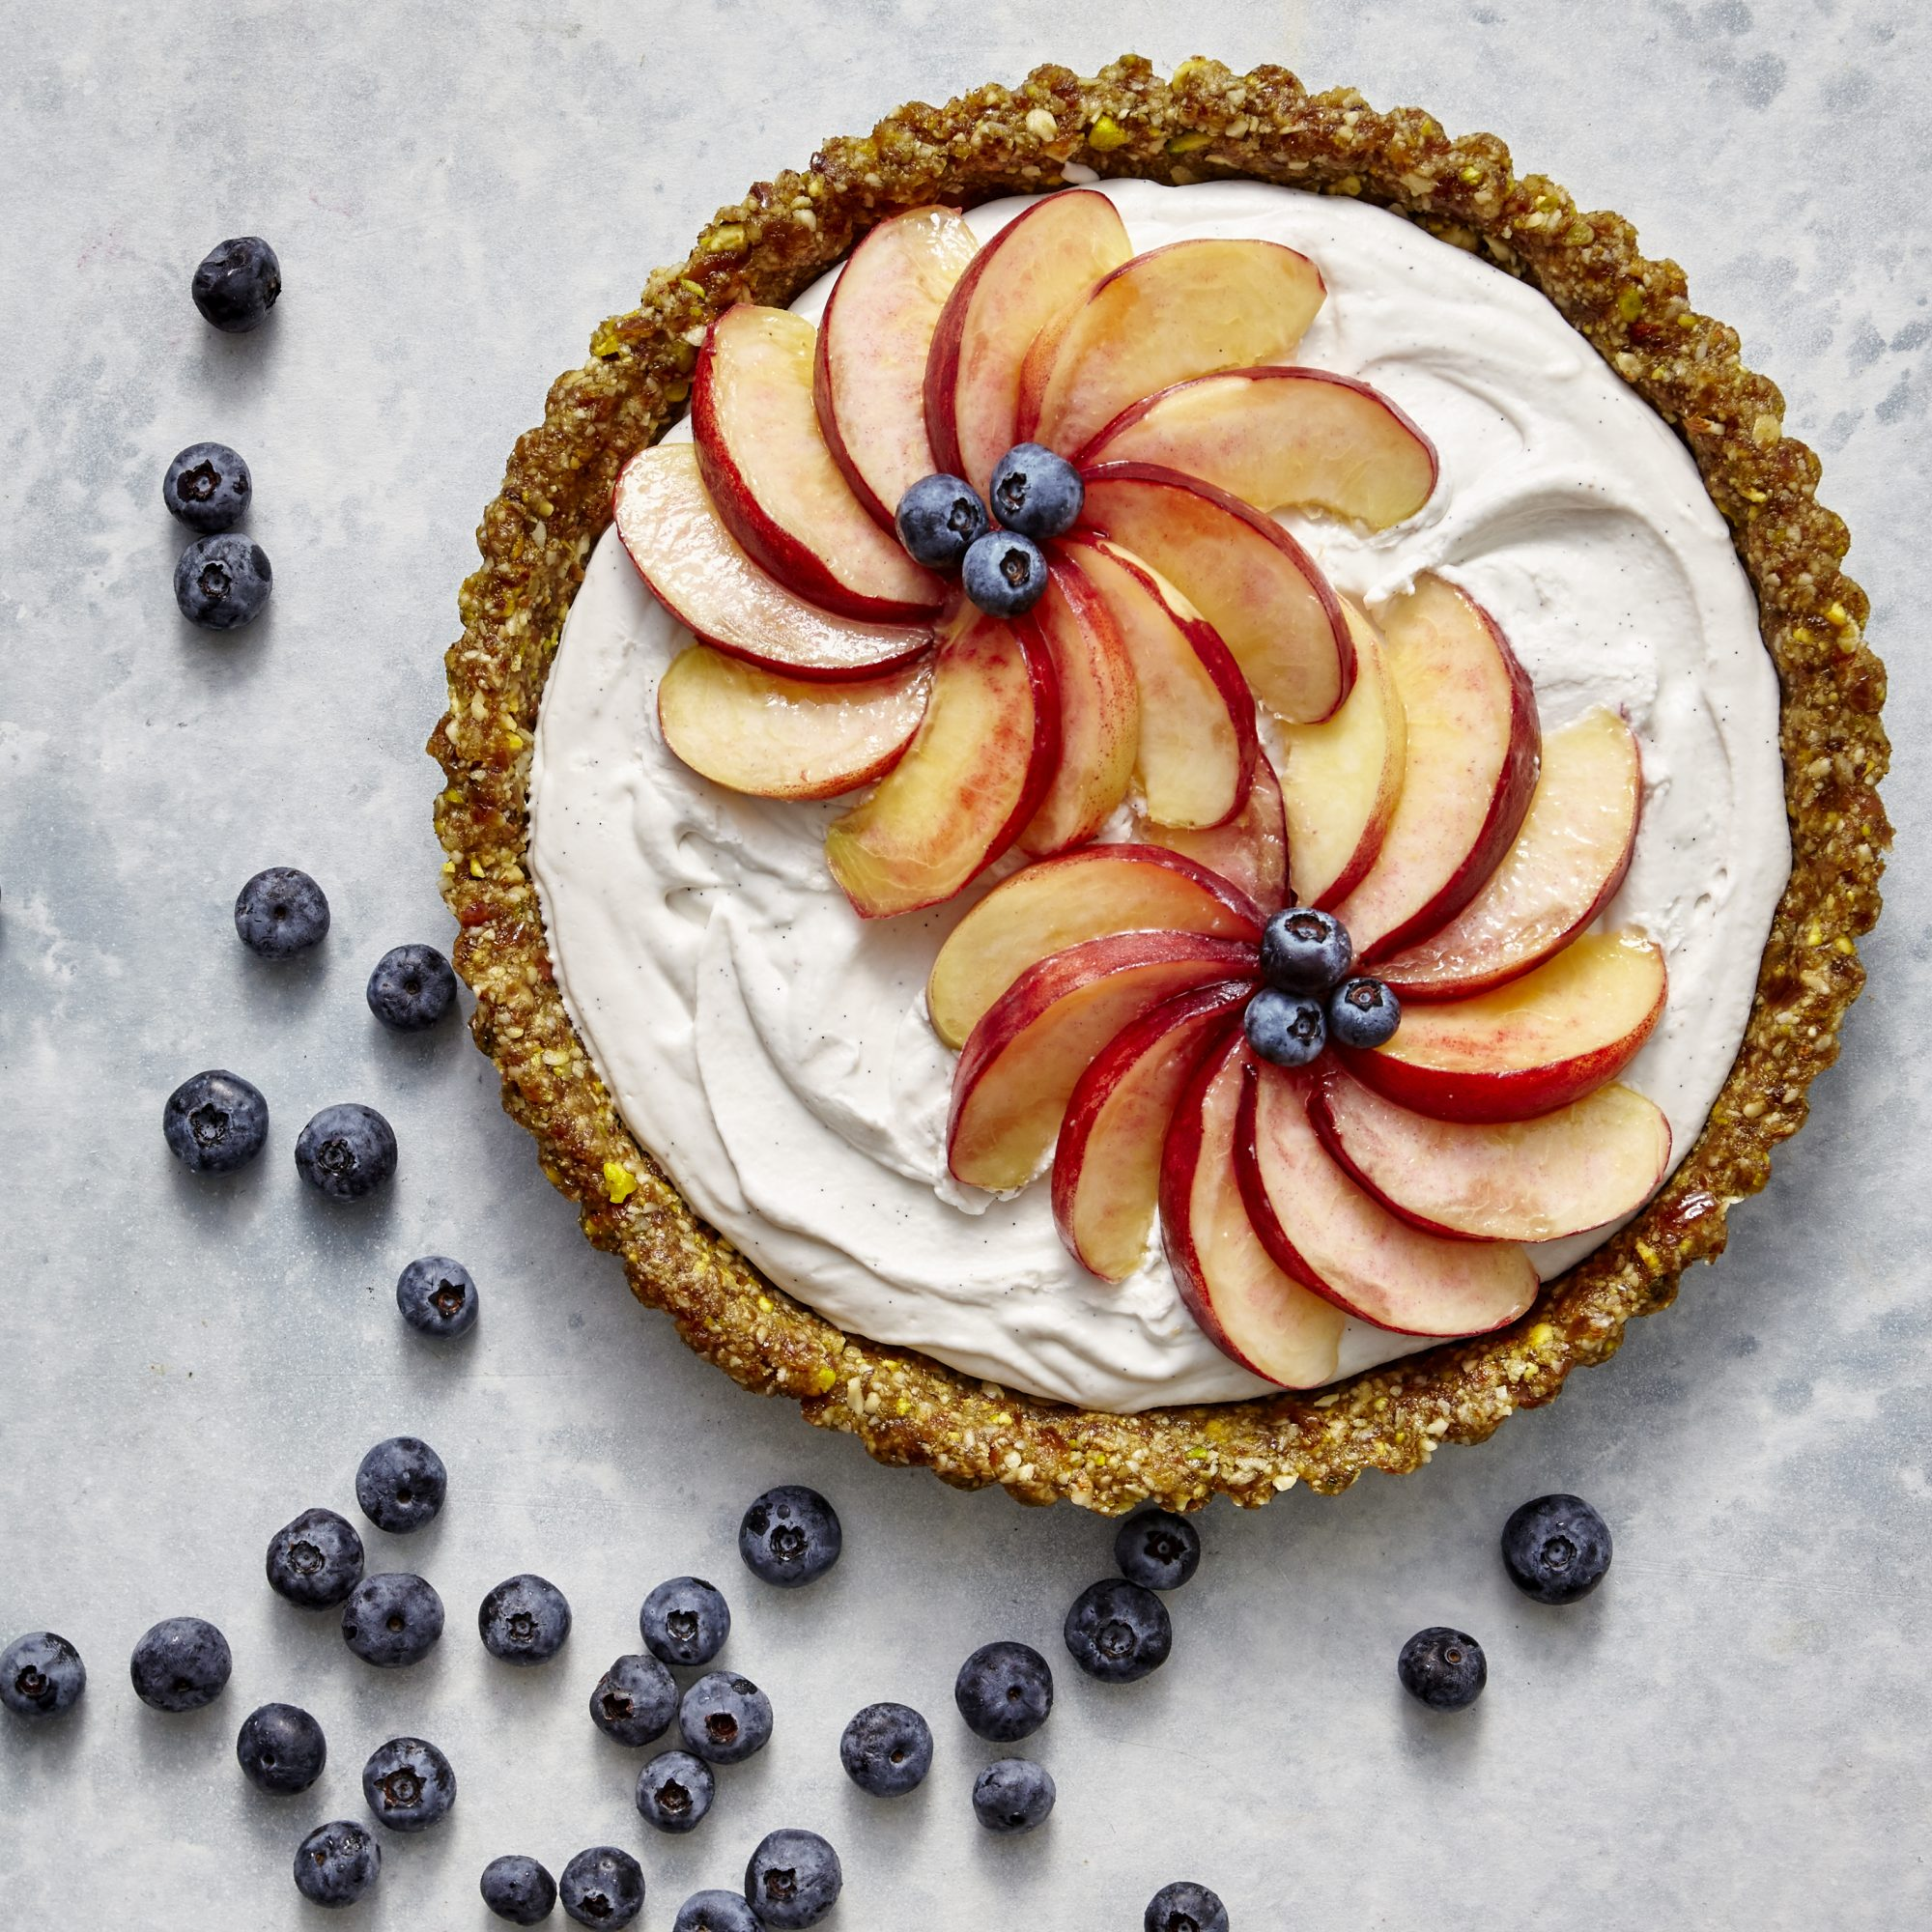 mr-Vegan Coconut Cream Tart with White Peaches and Blueberries image